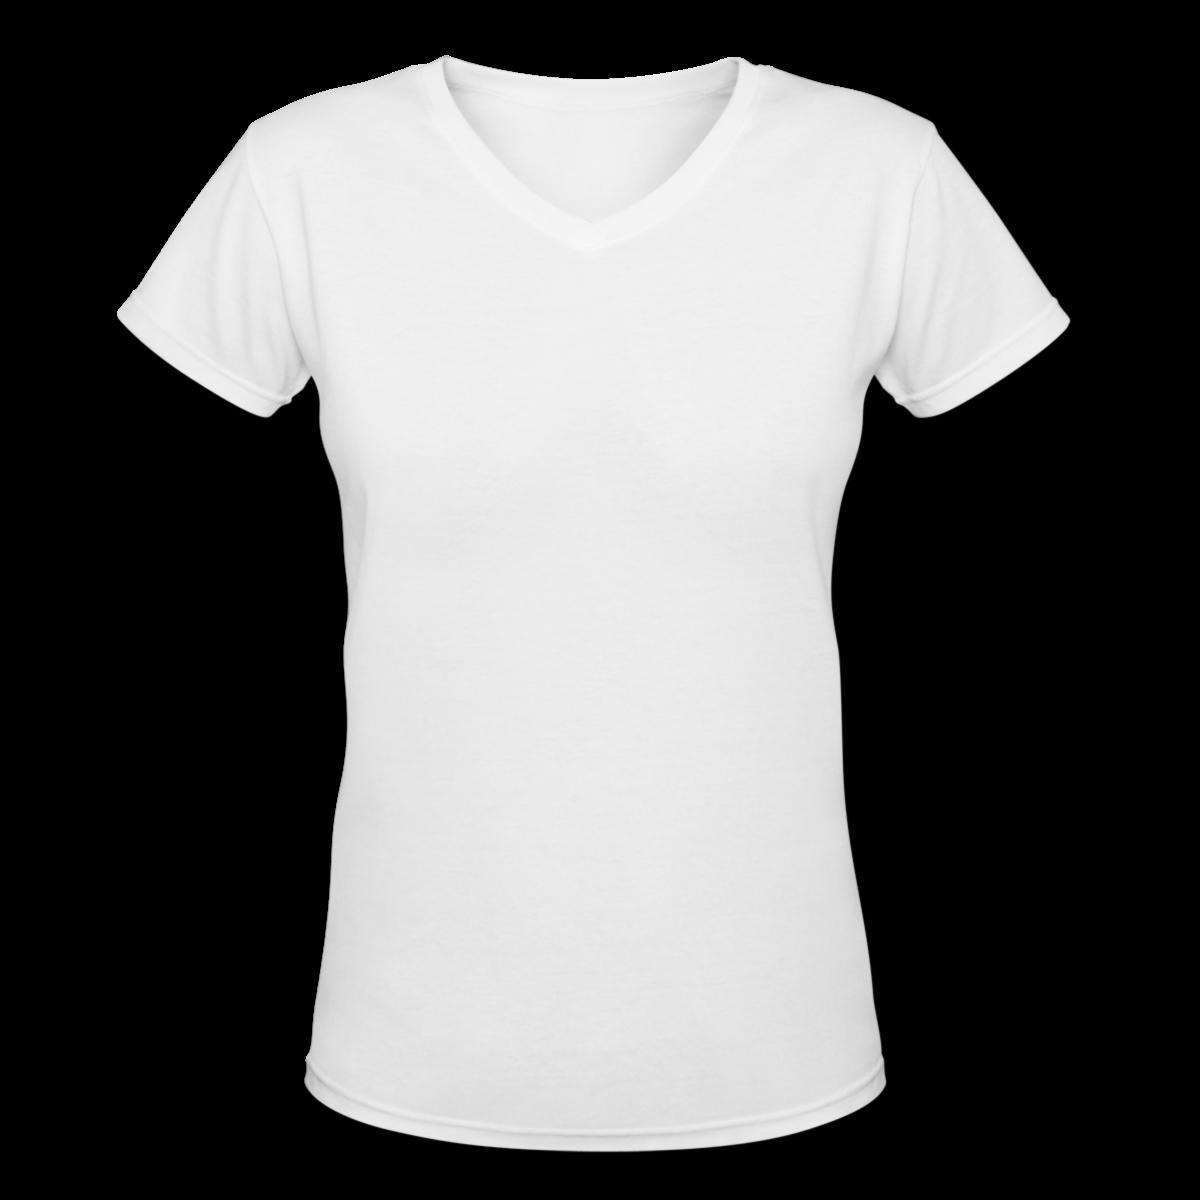 Plain white v neck t shirt clipart best for The best plain white t shirts